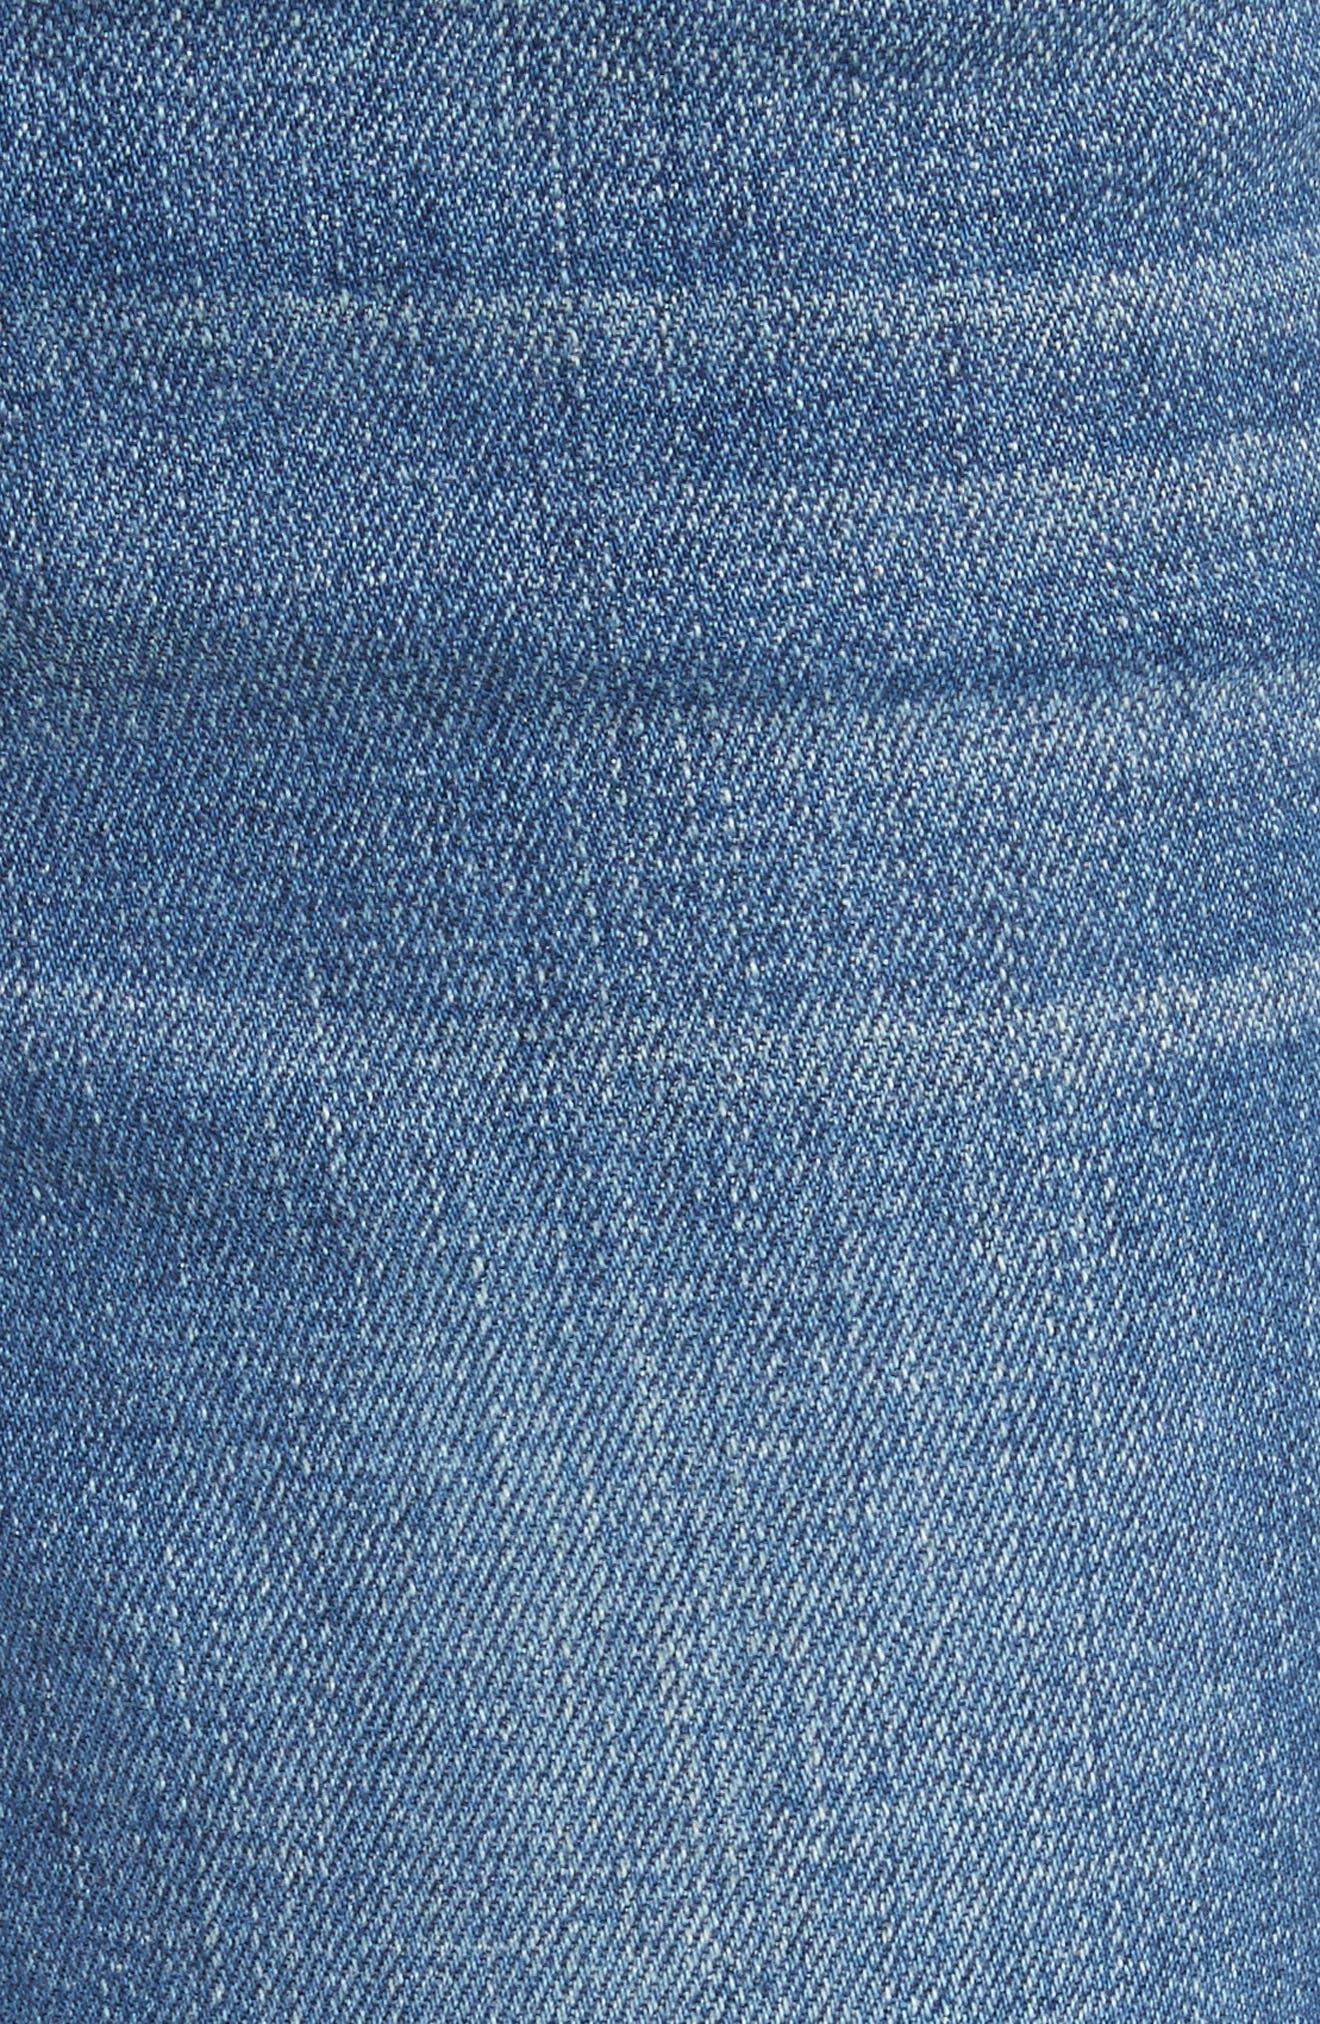 Anjelique Studded Ankle Skinny Jeans,                             Alternate thumbnail 5, color,                             400